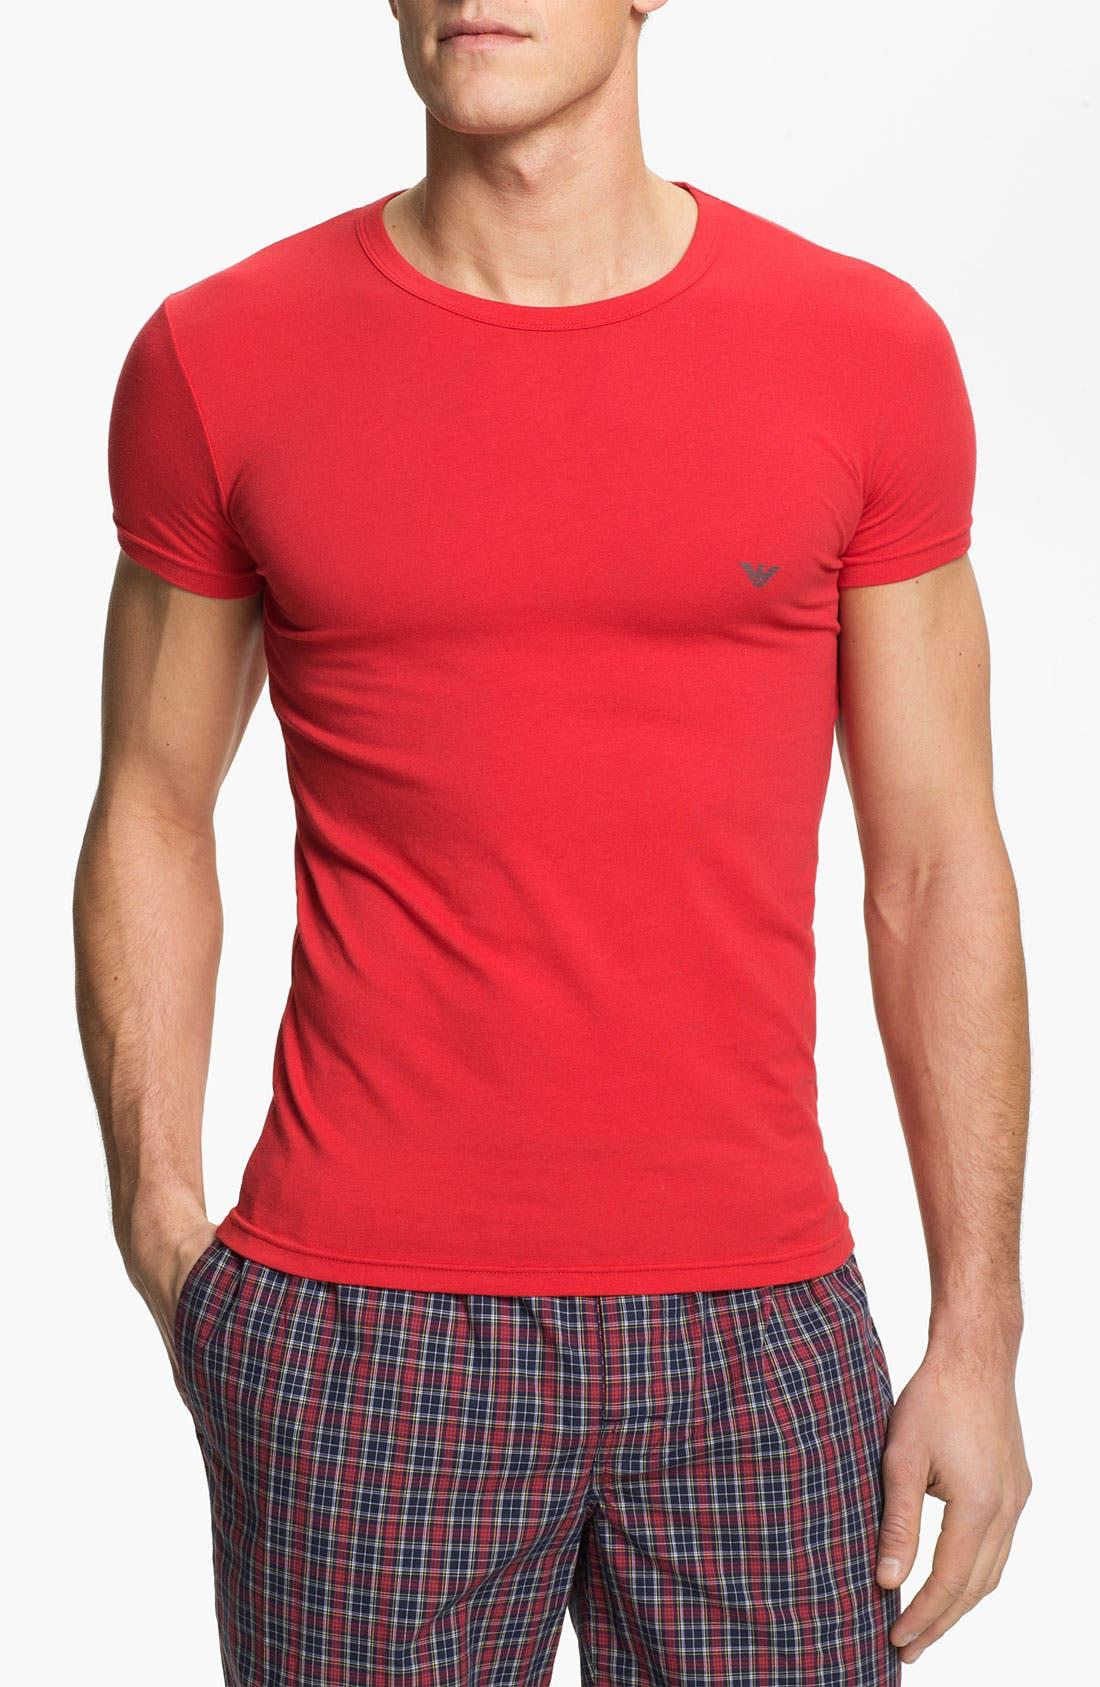 Alternate Image 1 Selected - Emporio Armani 'Eagle' Stretch Cotton Crewneck T-Shirt